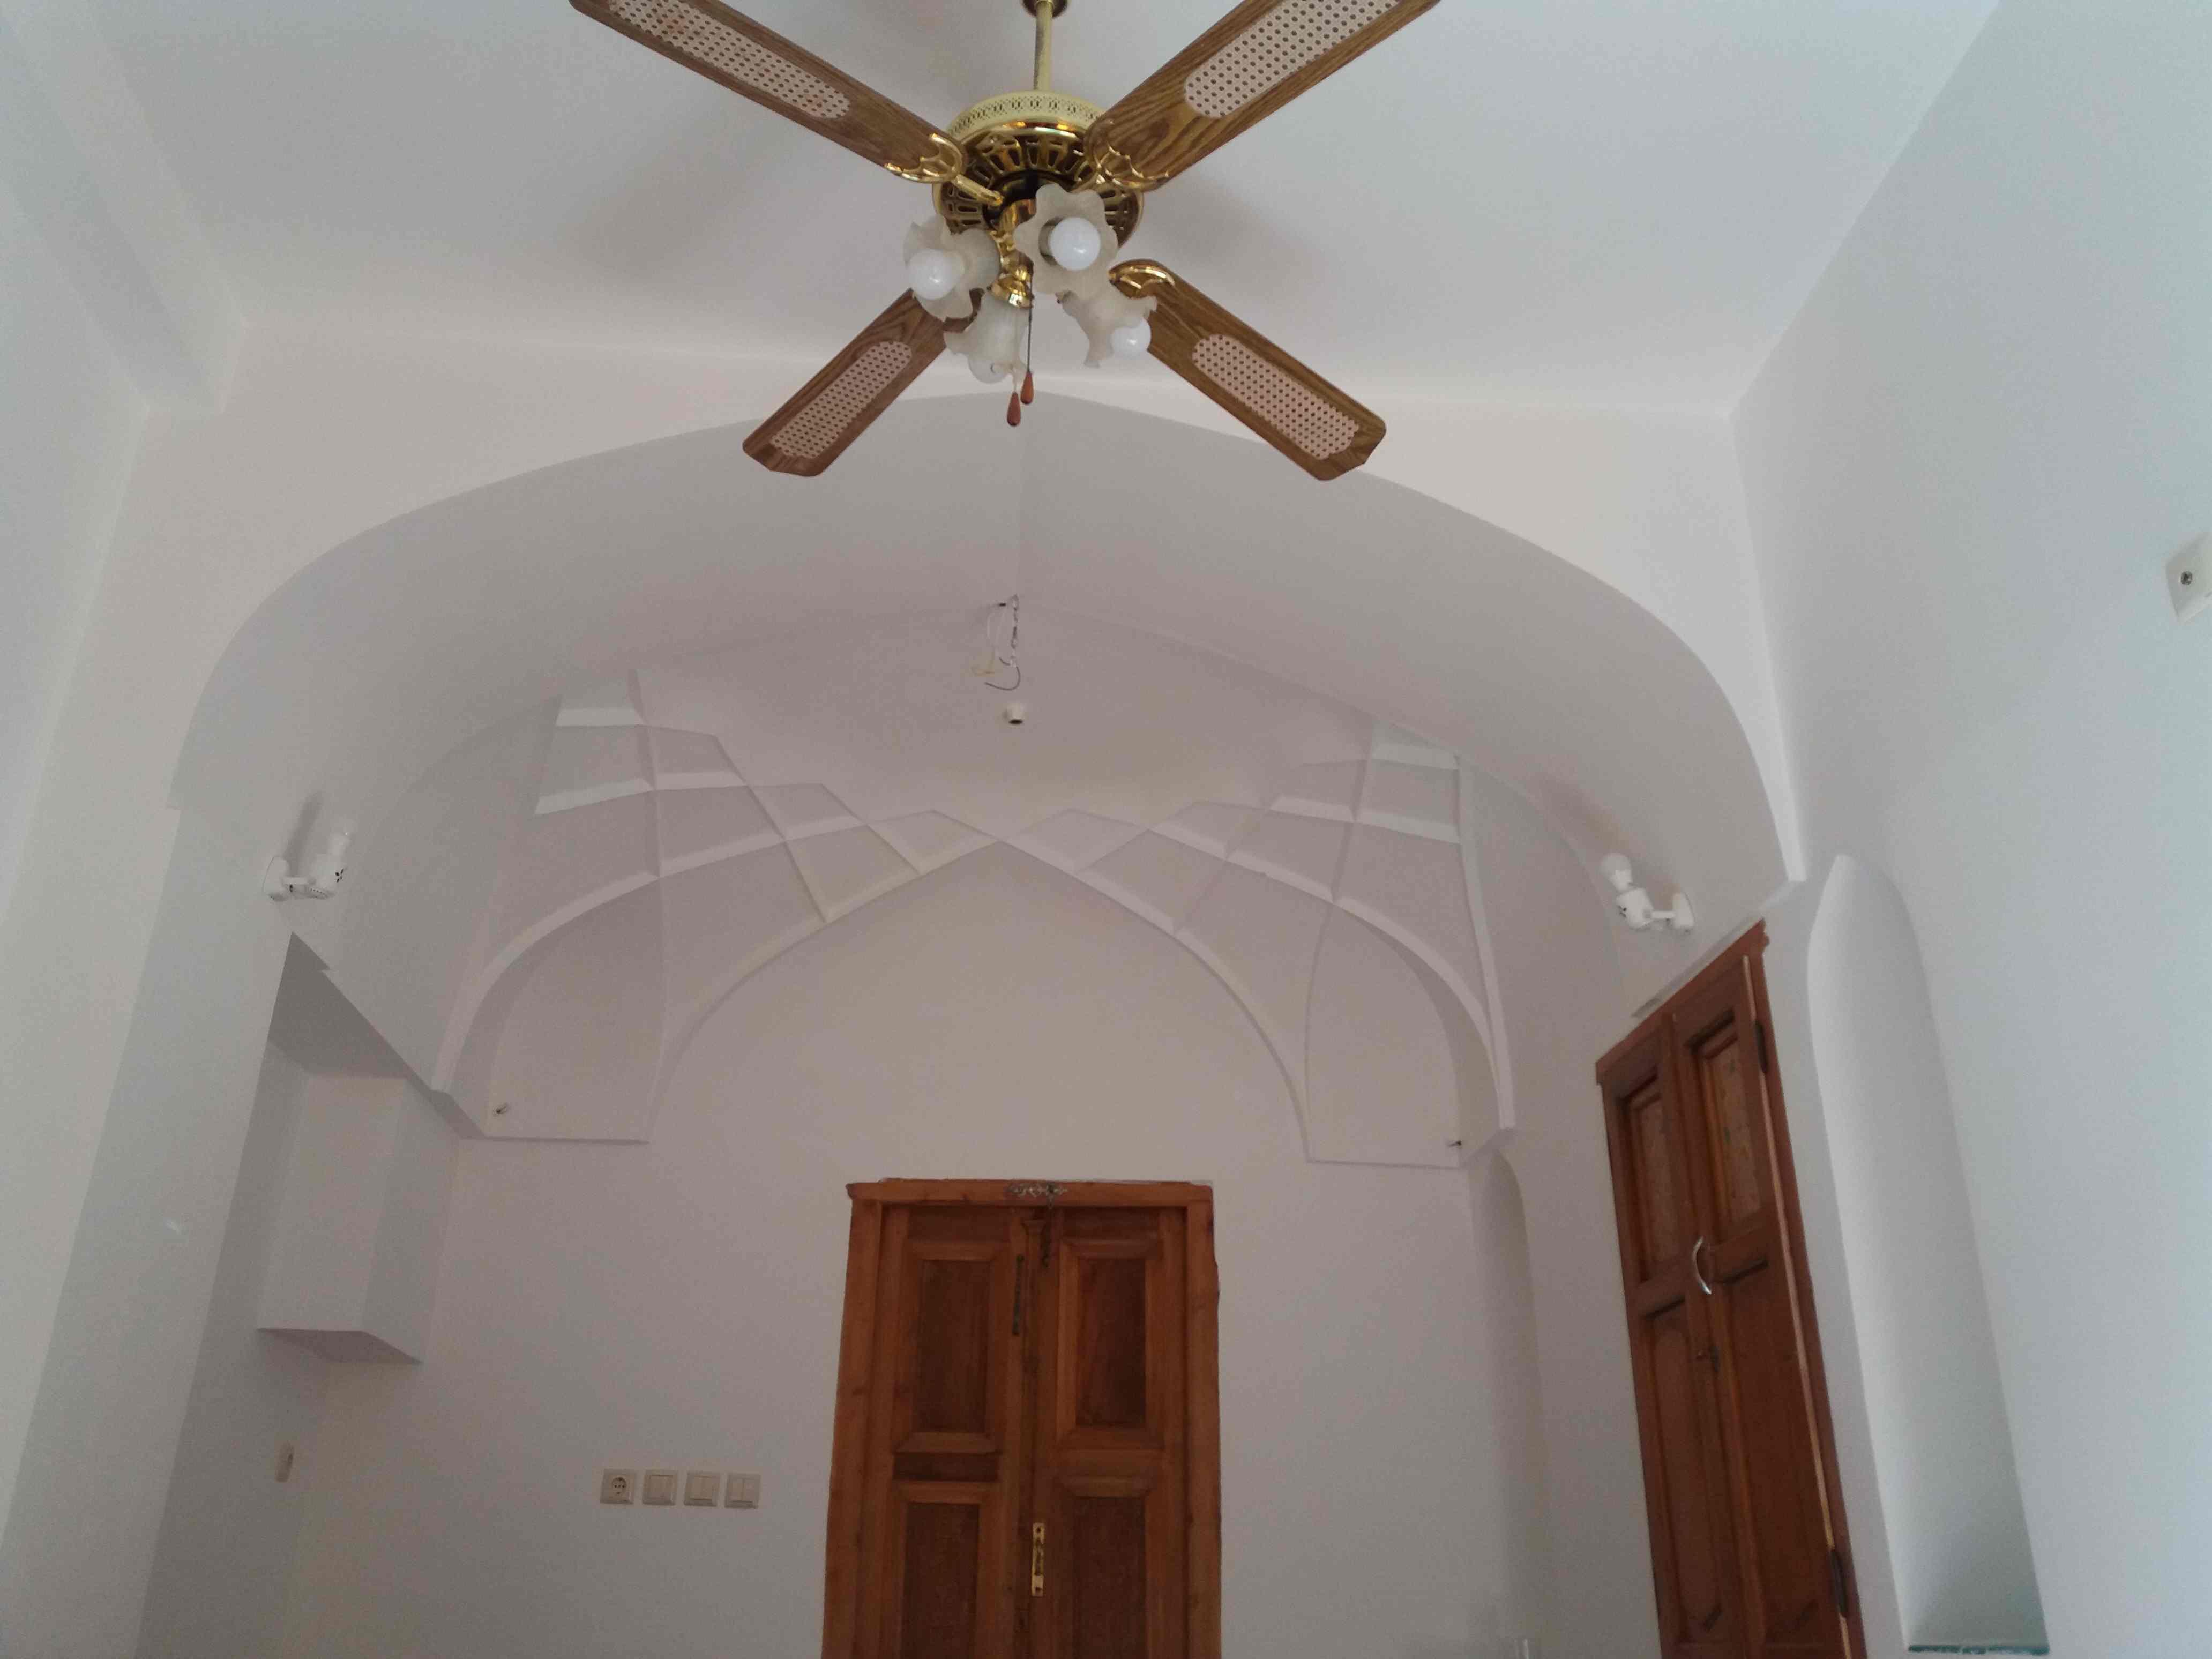 townee اقامتگاه سنتی در مرکز شهر اصفهان